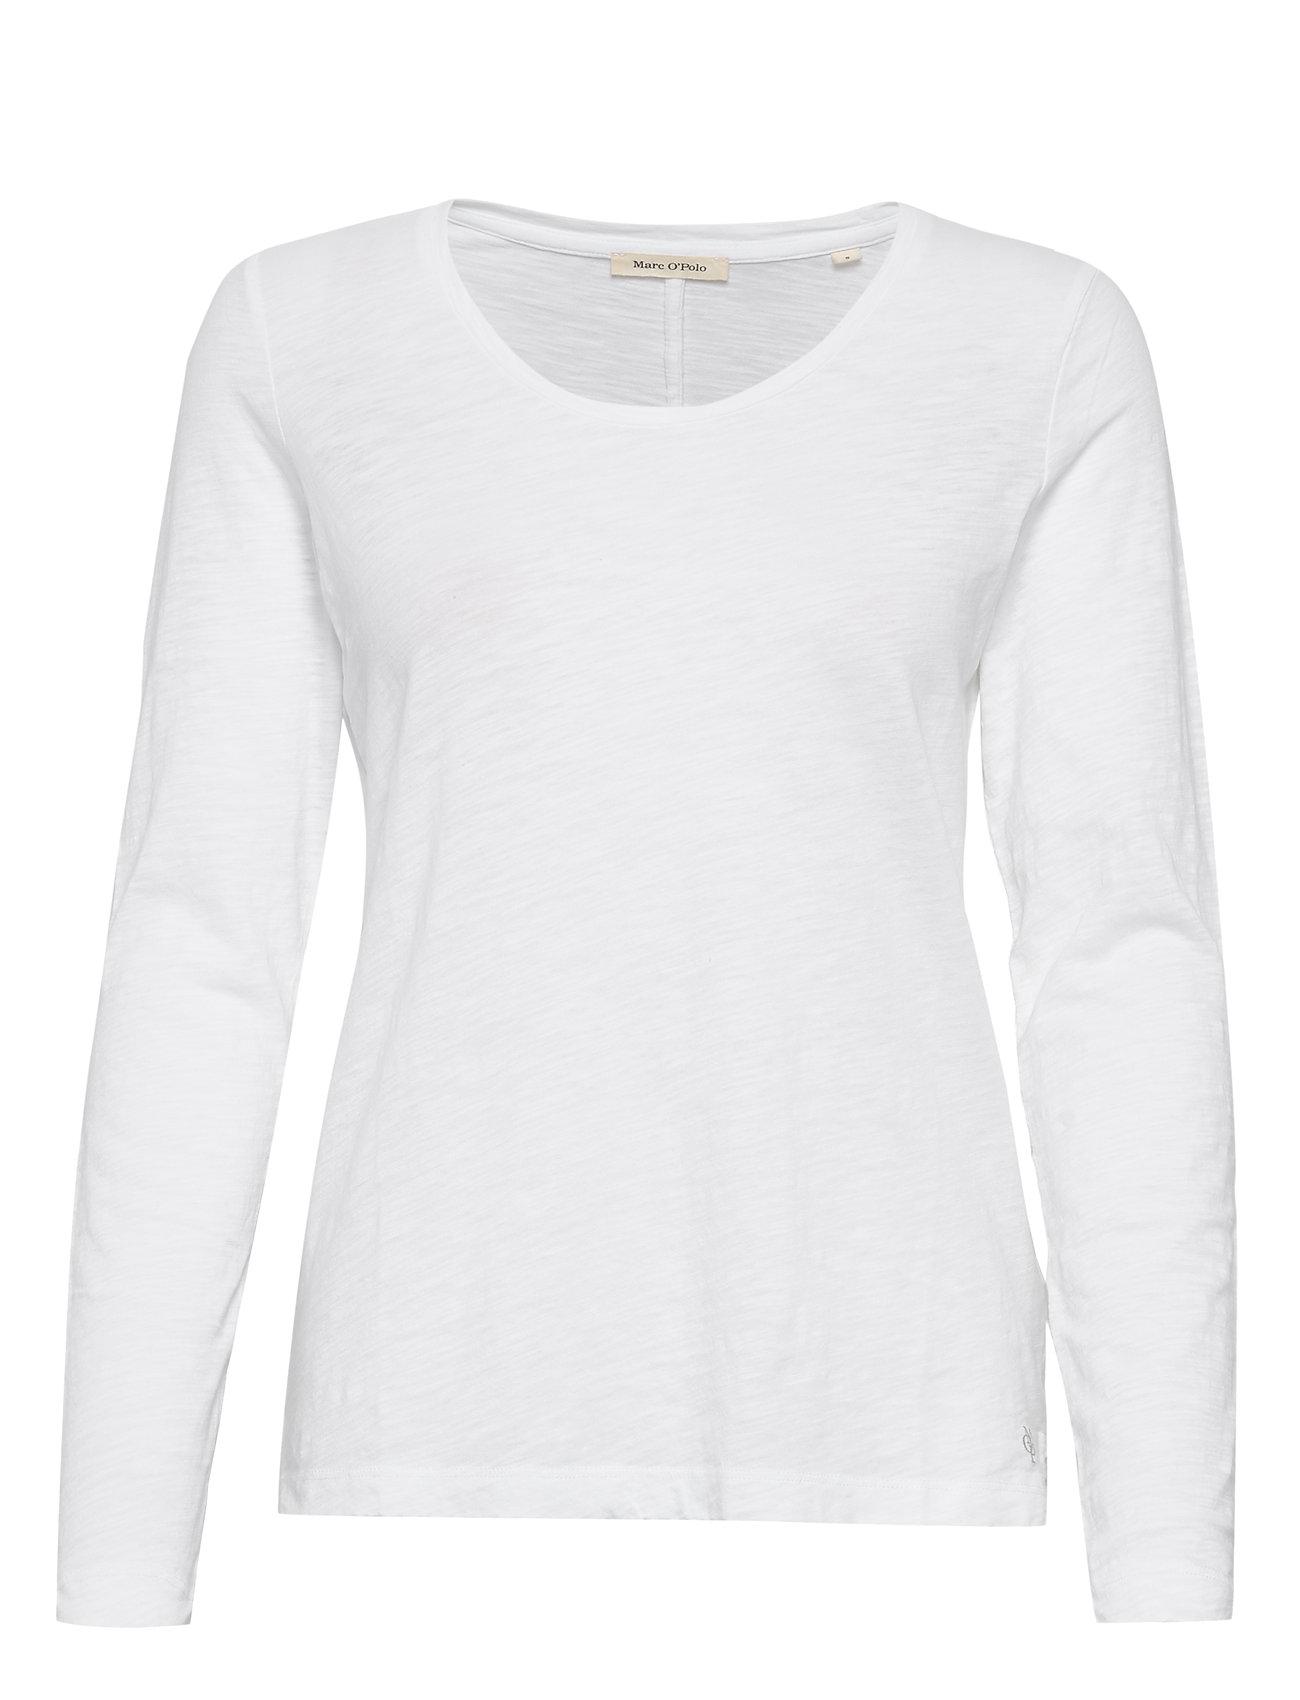 Image of T-Shirt Long Sleeve Langærmet T-shirt Hvid Marc O'Polo (3336494553)